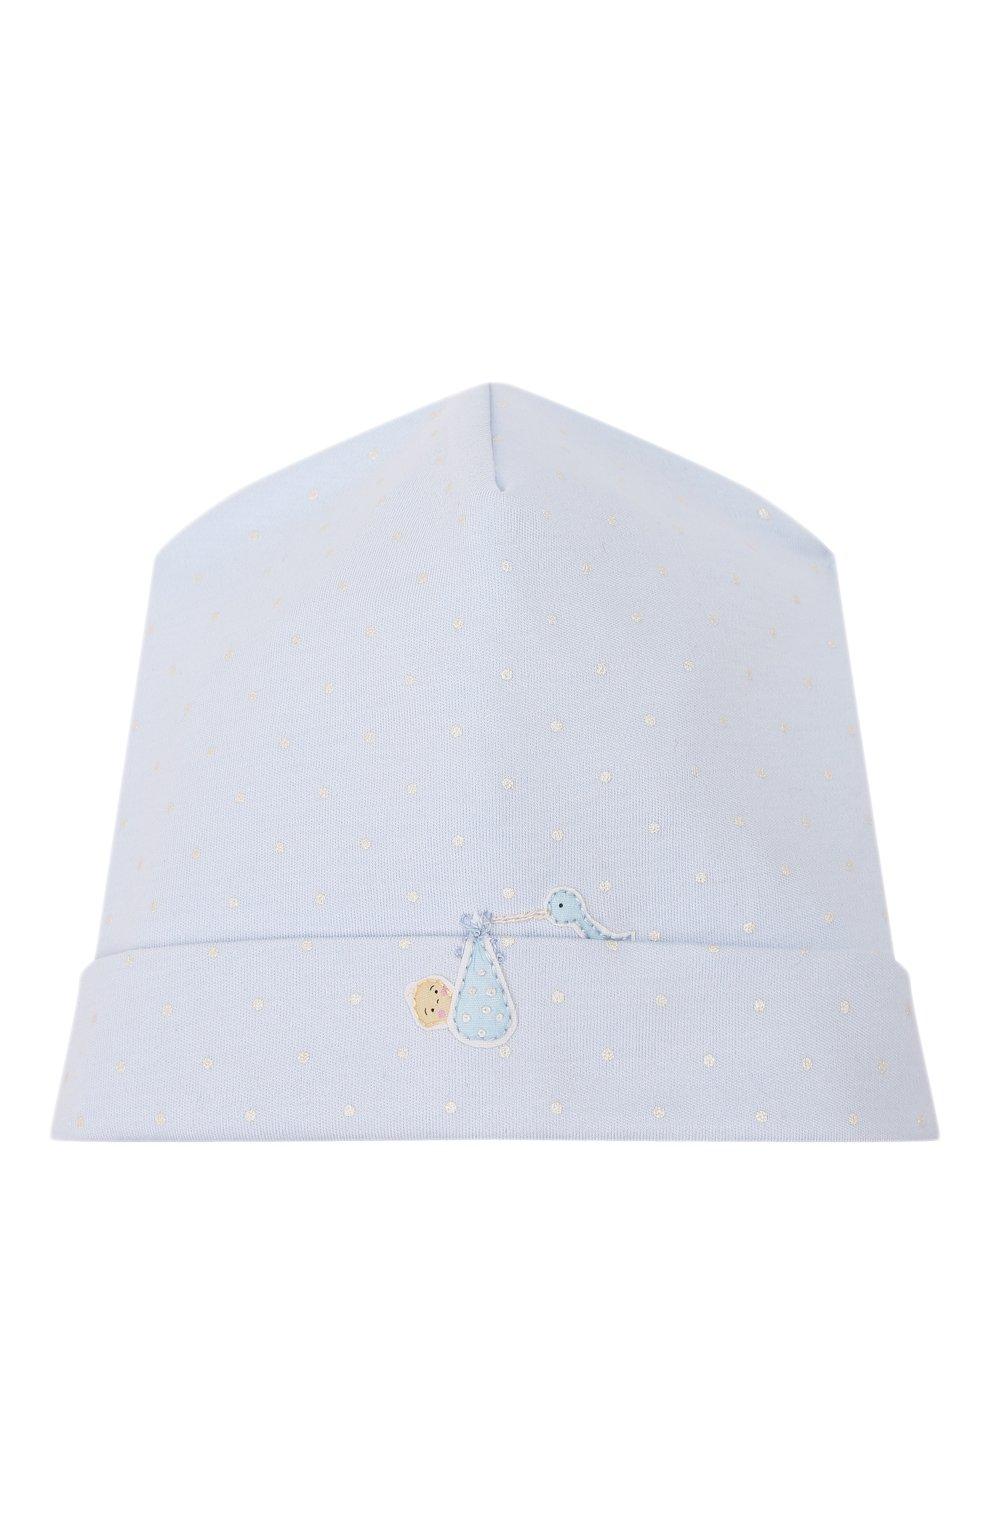 Детского шапка noah's friends MAGNOLIA BABY синего цвета, арт. E109-50P-LB | Фото 1 (Материал: Текстиль, Хлопок; Кросс-КТ НВ: Шапочки-аксессуары)